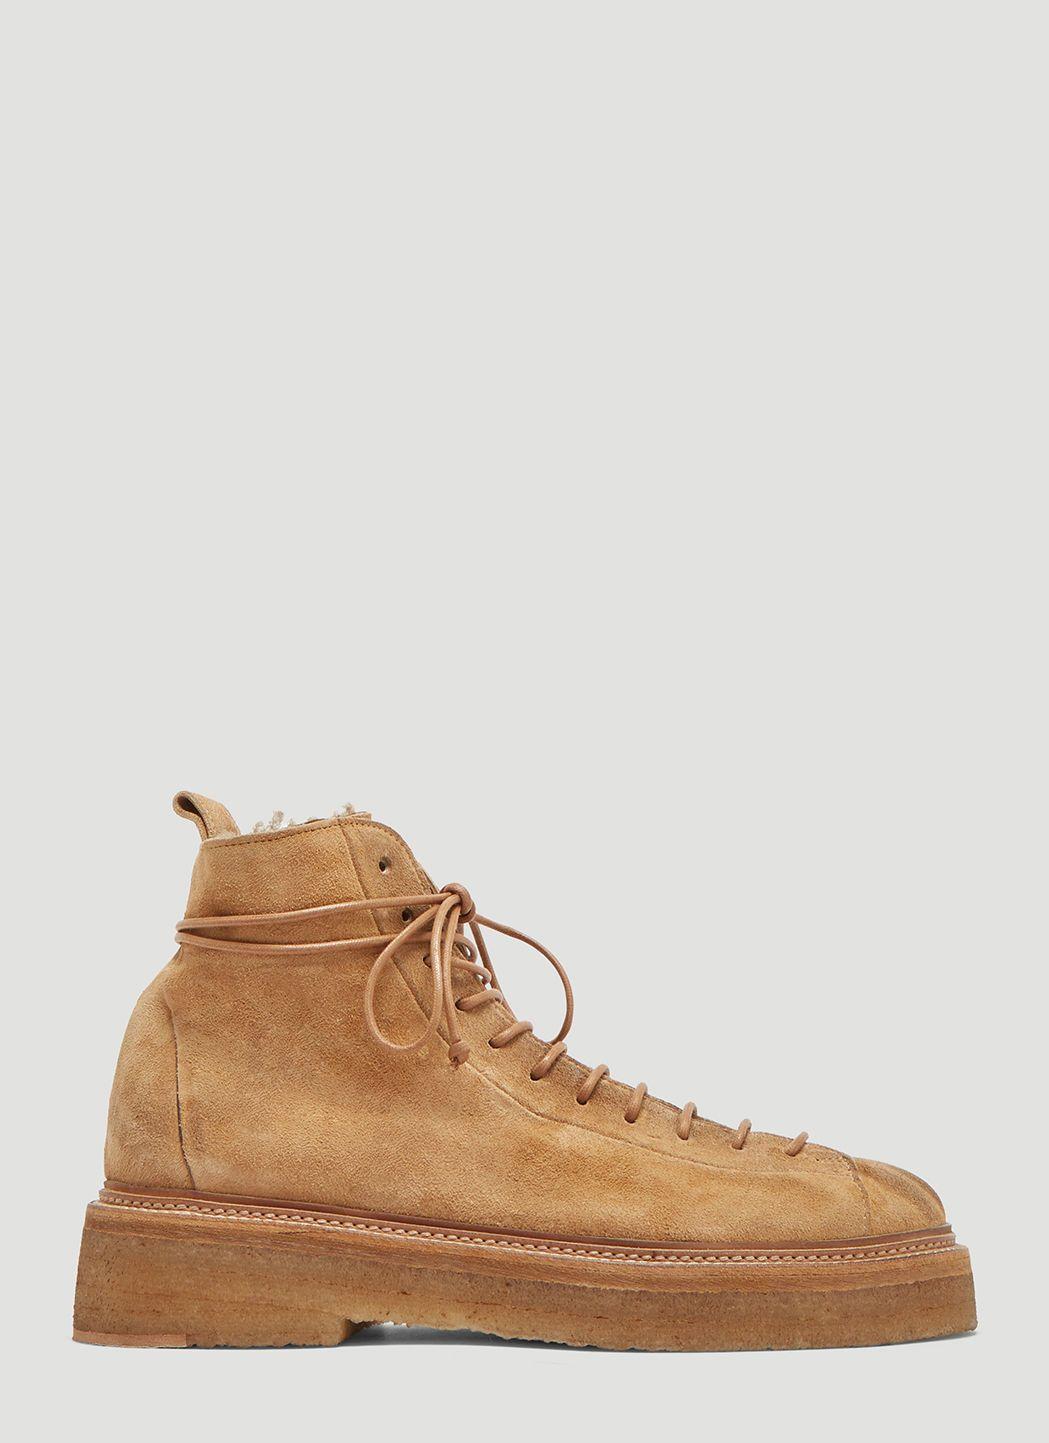 2e96617ac75 MARSÈLL Parruccona Shearling Lined Monkey Boots in Beige. #marsèll ...